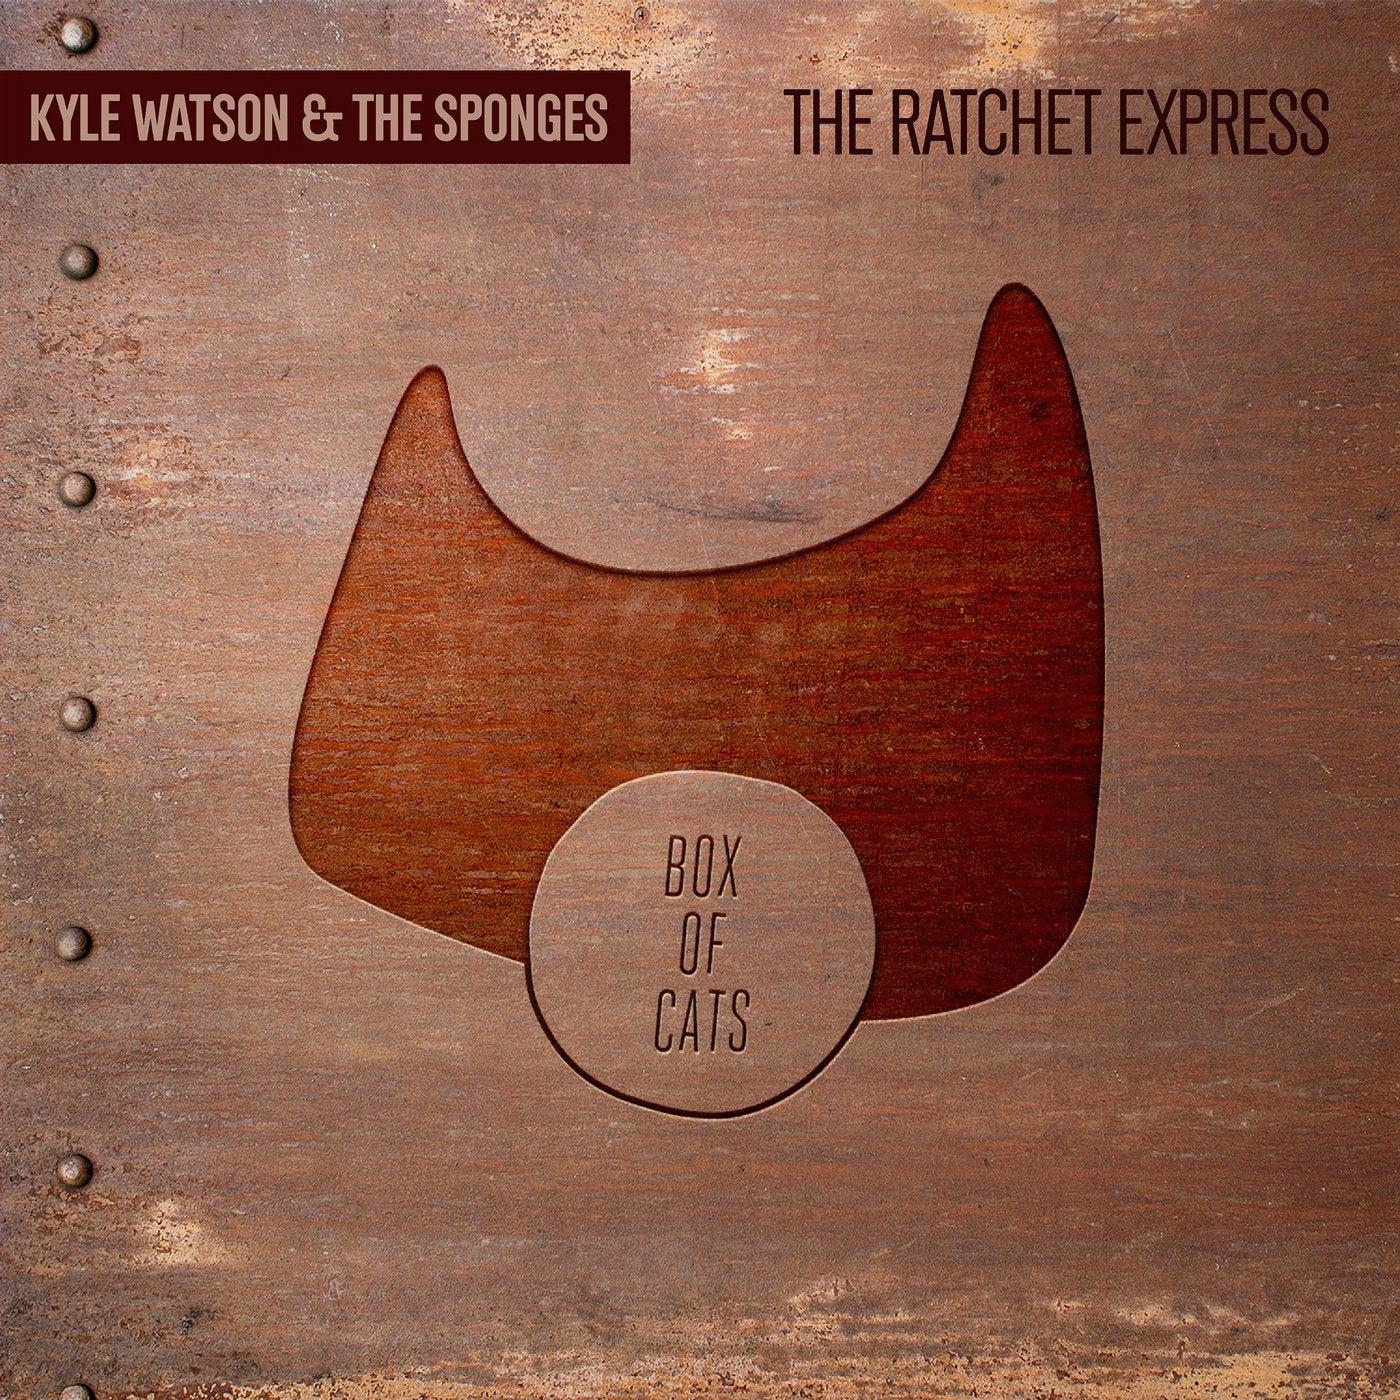 The Ratchet Express (Extended Mix)